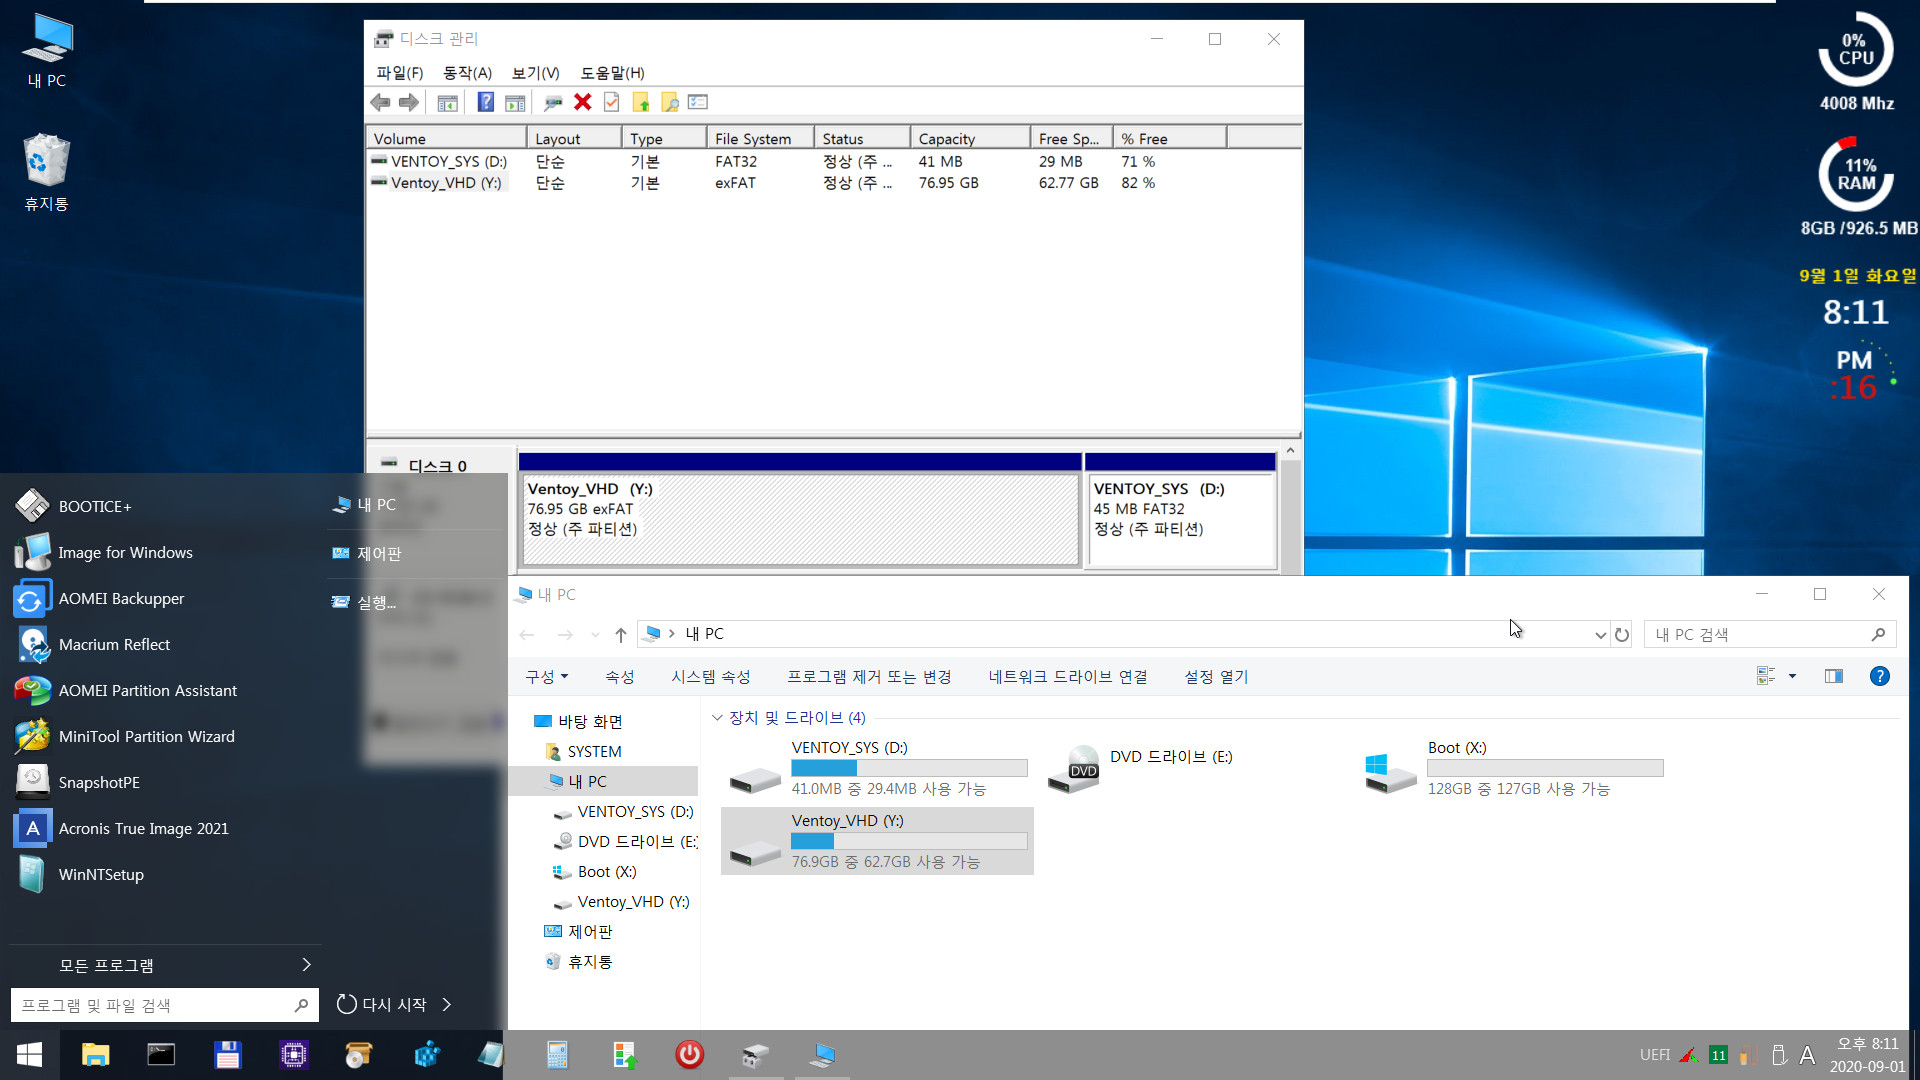 Ventoy-1.0.20을 VHD에 복사하여 부팅 테스트 (UEFI 부팅만 가능) - 오늘자 prince pe는 exfat 인식합니다 2020-09-01_201117.jpg